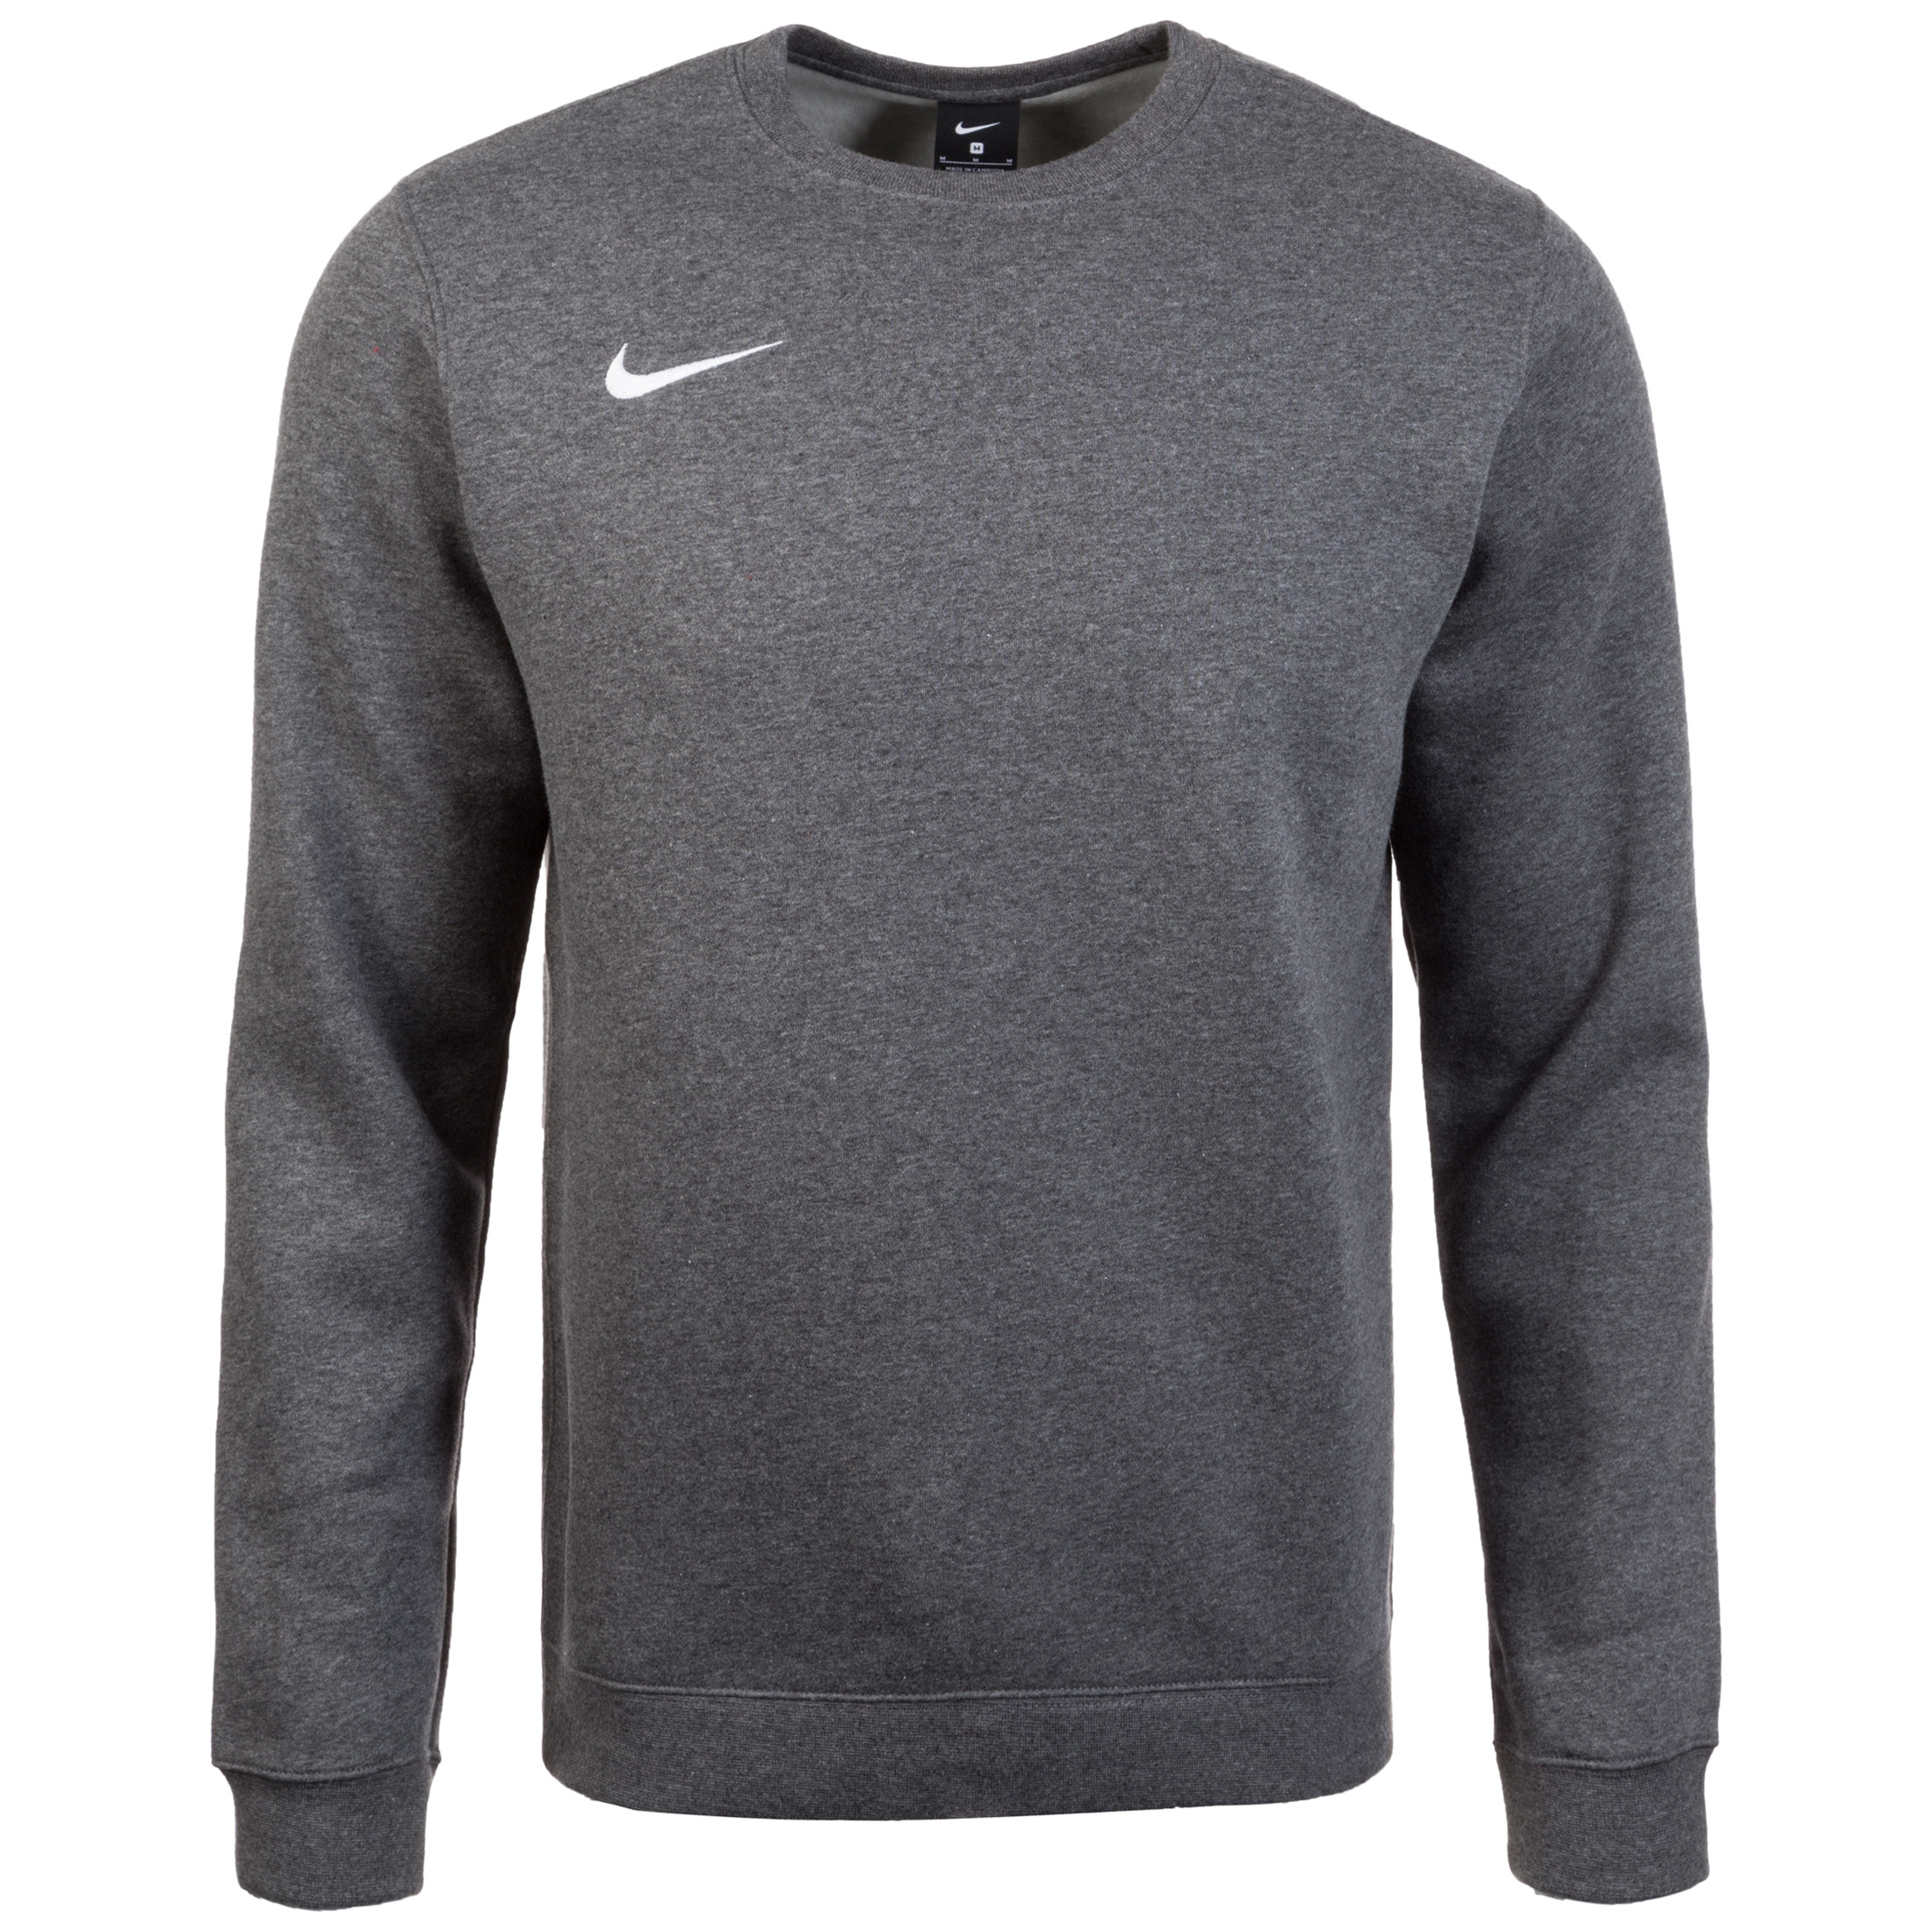 Nike Full Zip FLC Club19 Hoody Kapuzensweatjacke Herren grau AJ1313 063 XL